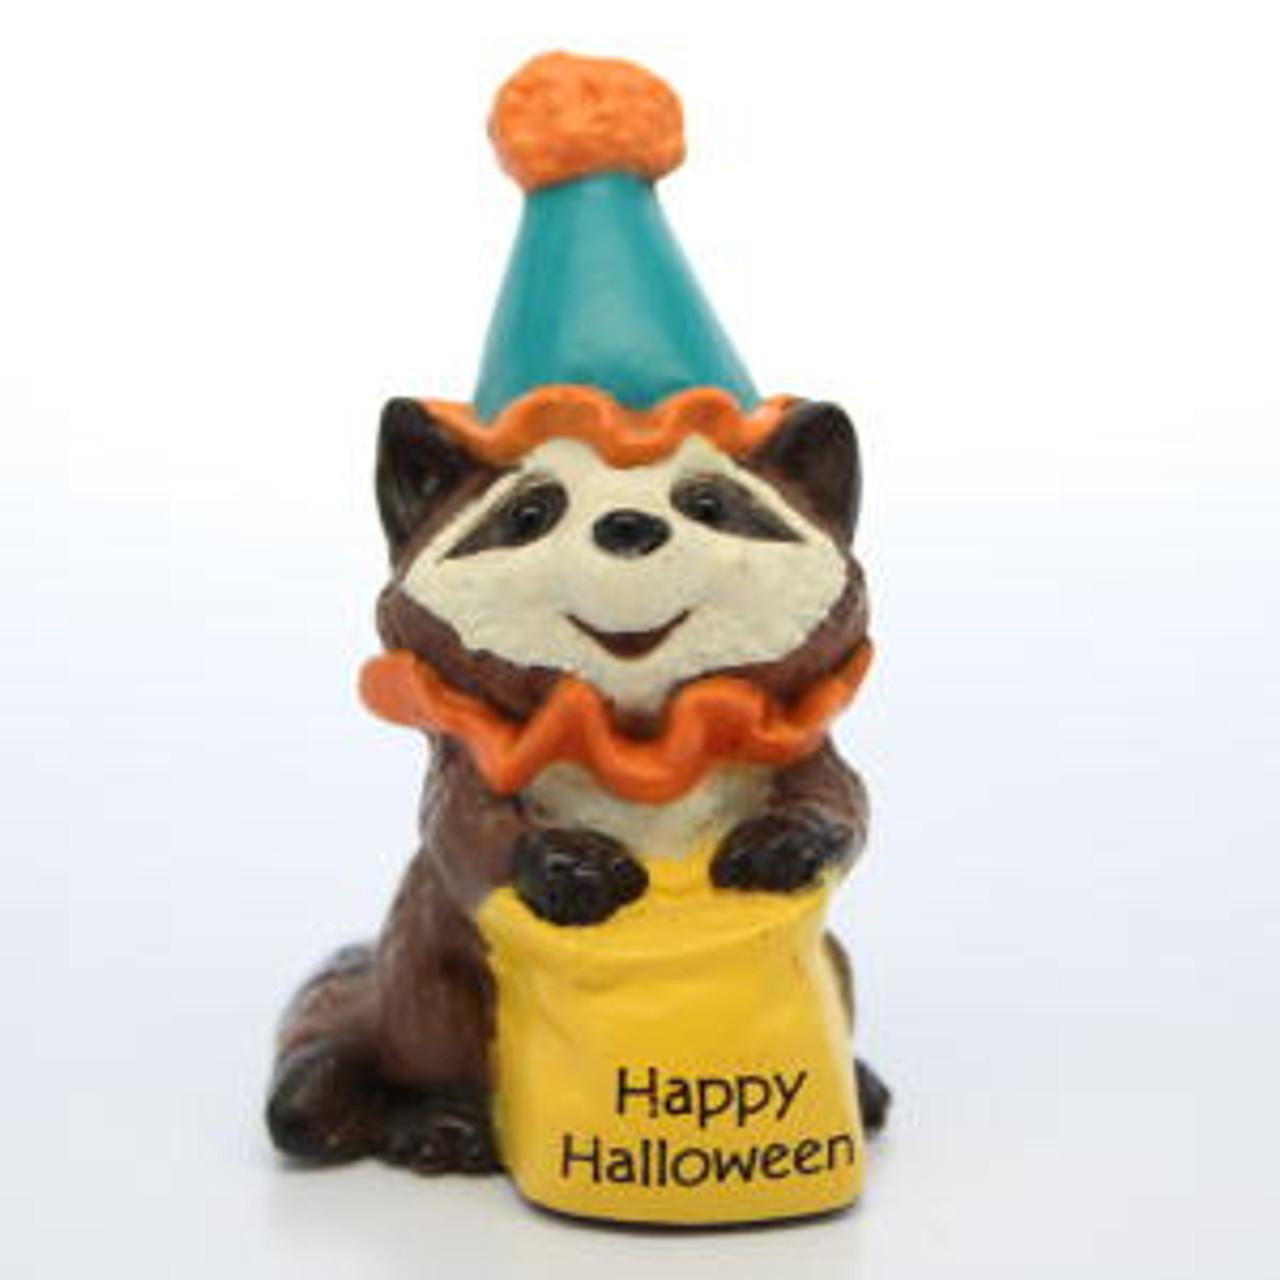 1989 Hallmark Raccoon Clown NEW Merry Miniature HALLOWEEN Never DisplayedQFM1575